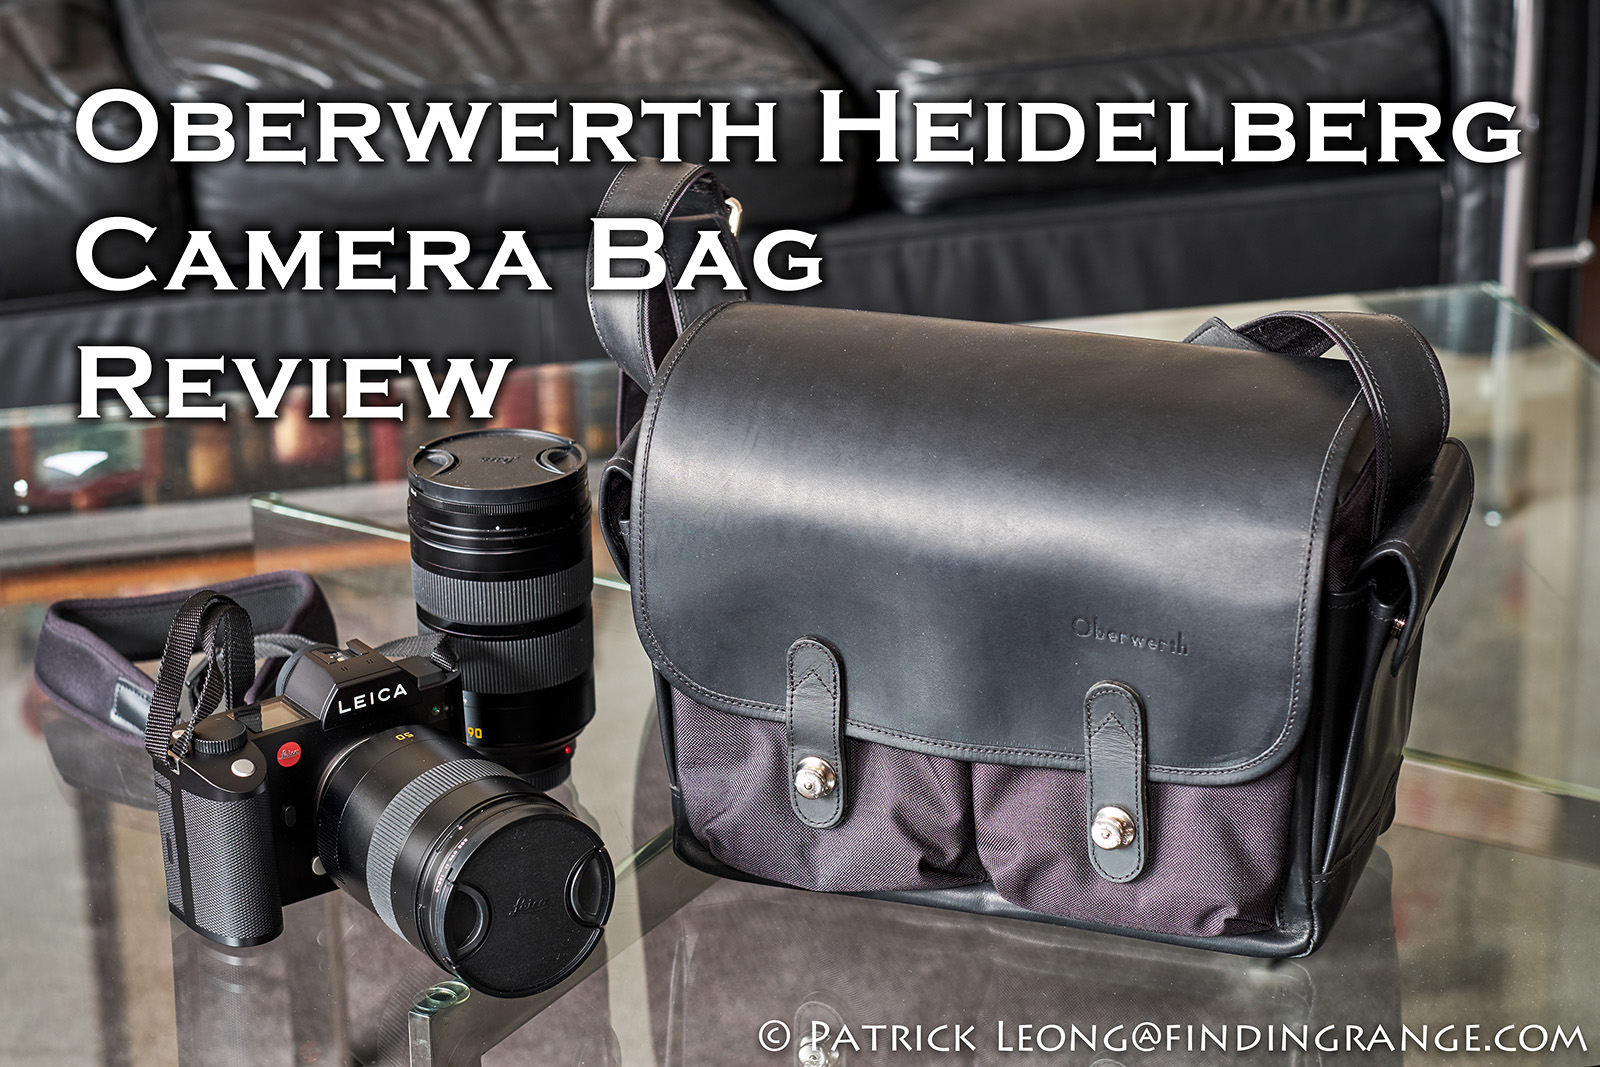 Oberwerth-Heidelberg-Leica-SL-Review-1